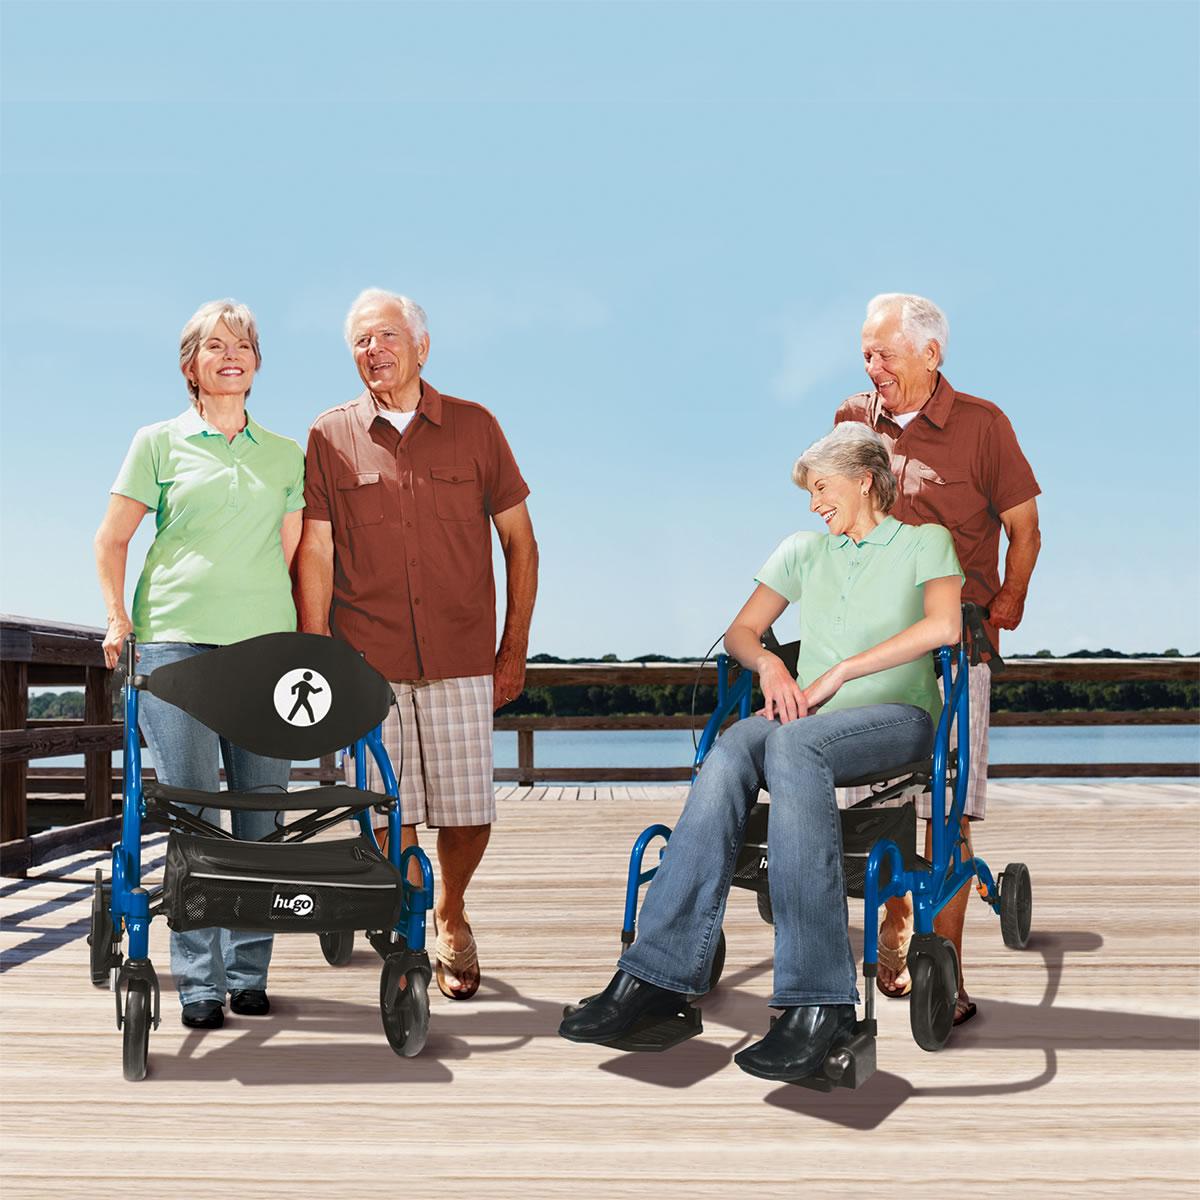 hugo navigator walker transport chair royal throne hugo® navigator™ side-folding rolling & –